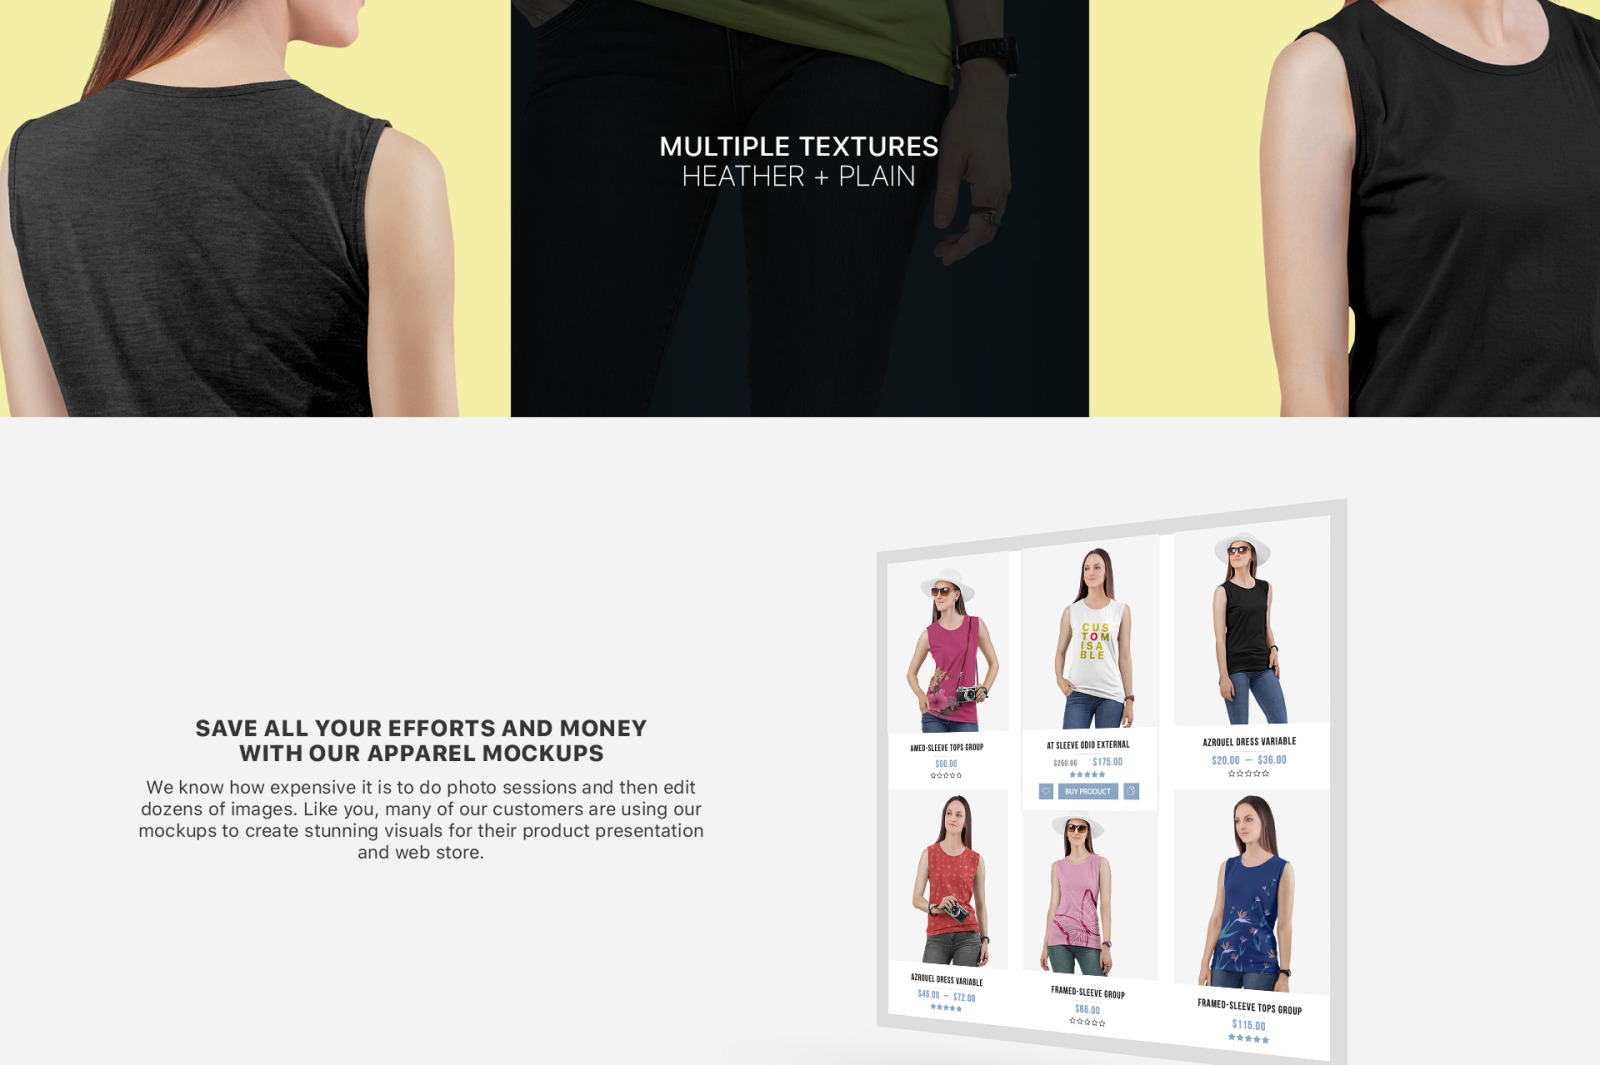 Women S Sleeveless Shirt Mockup Set In Apparel Mockups On Yellow